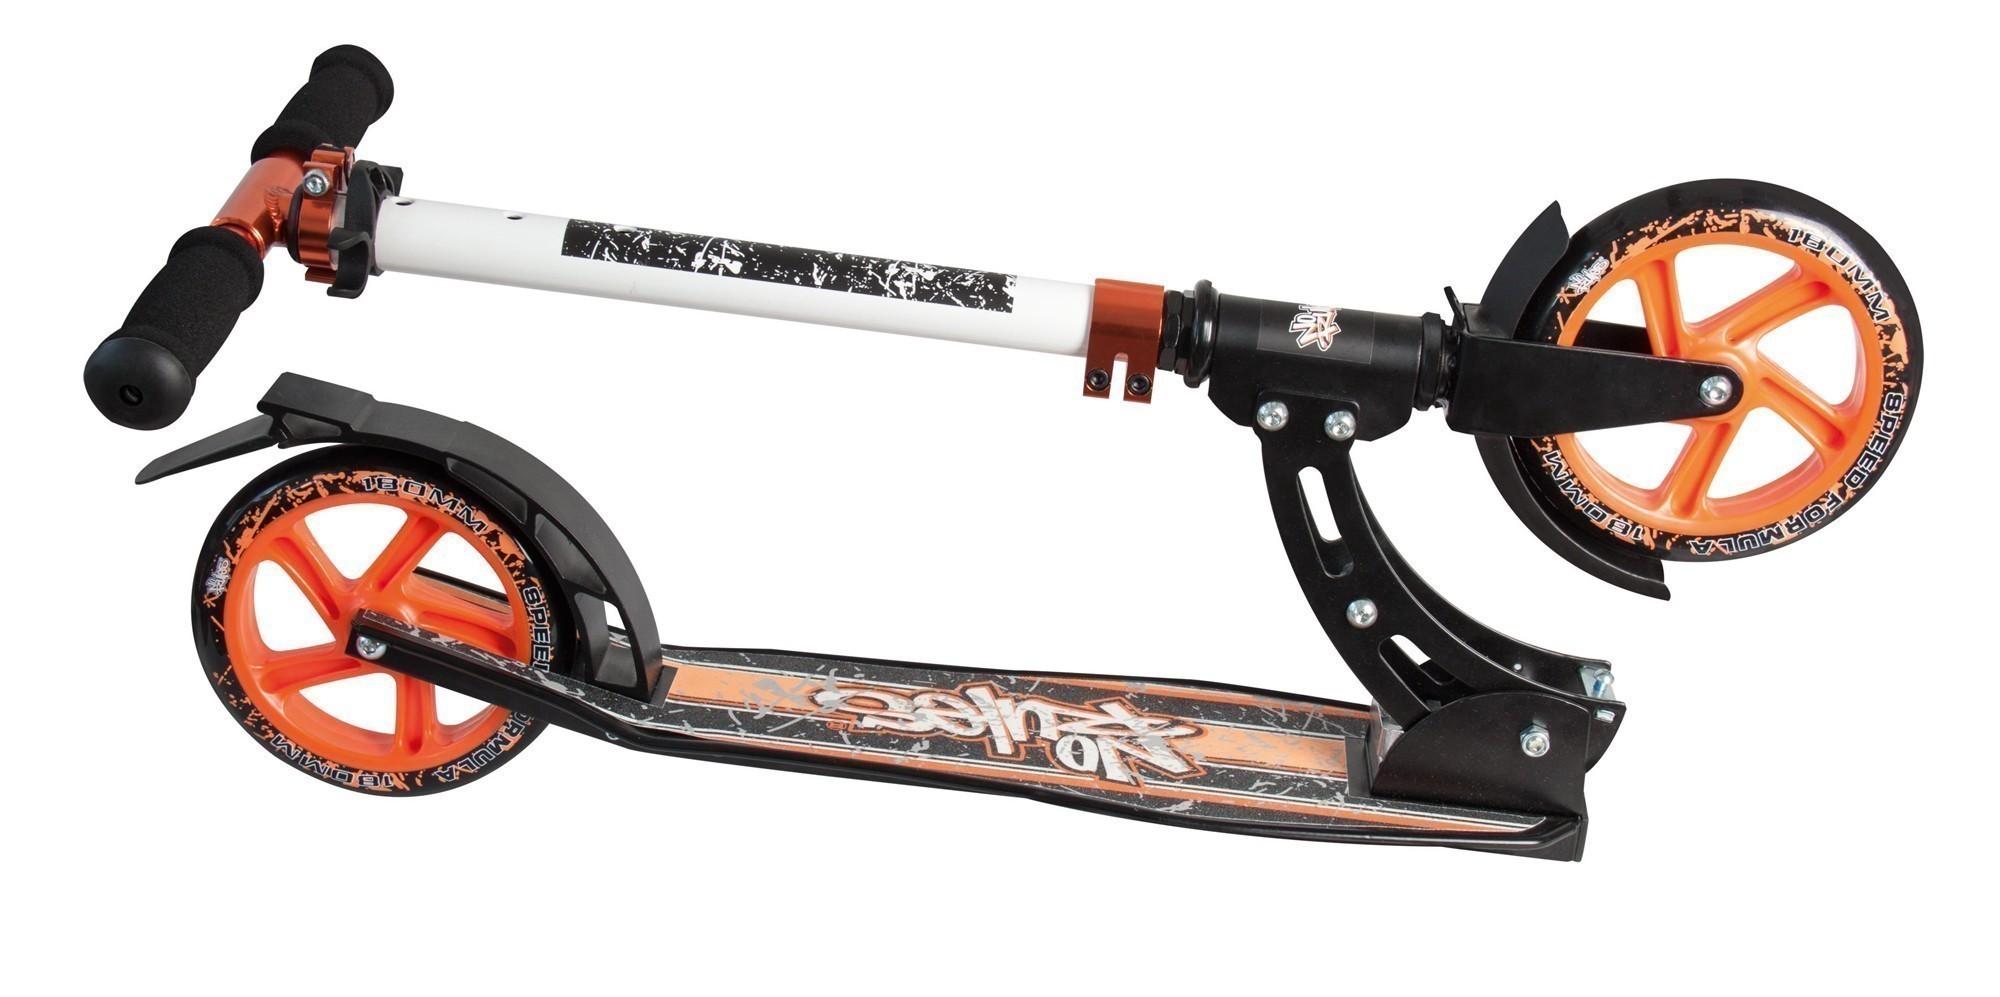 Alu Scooter / Cityroller No Rules 180 orange schwarz Bild 2